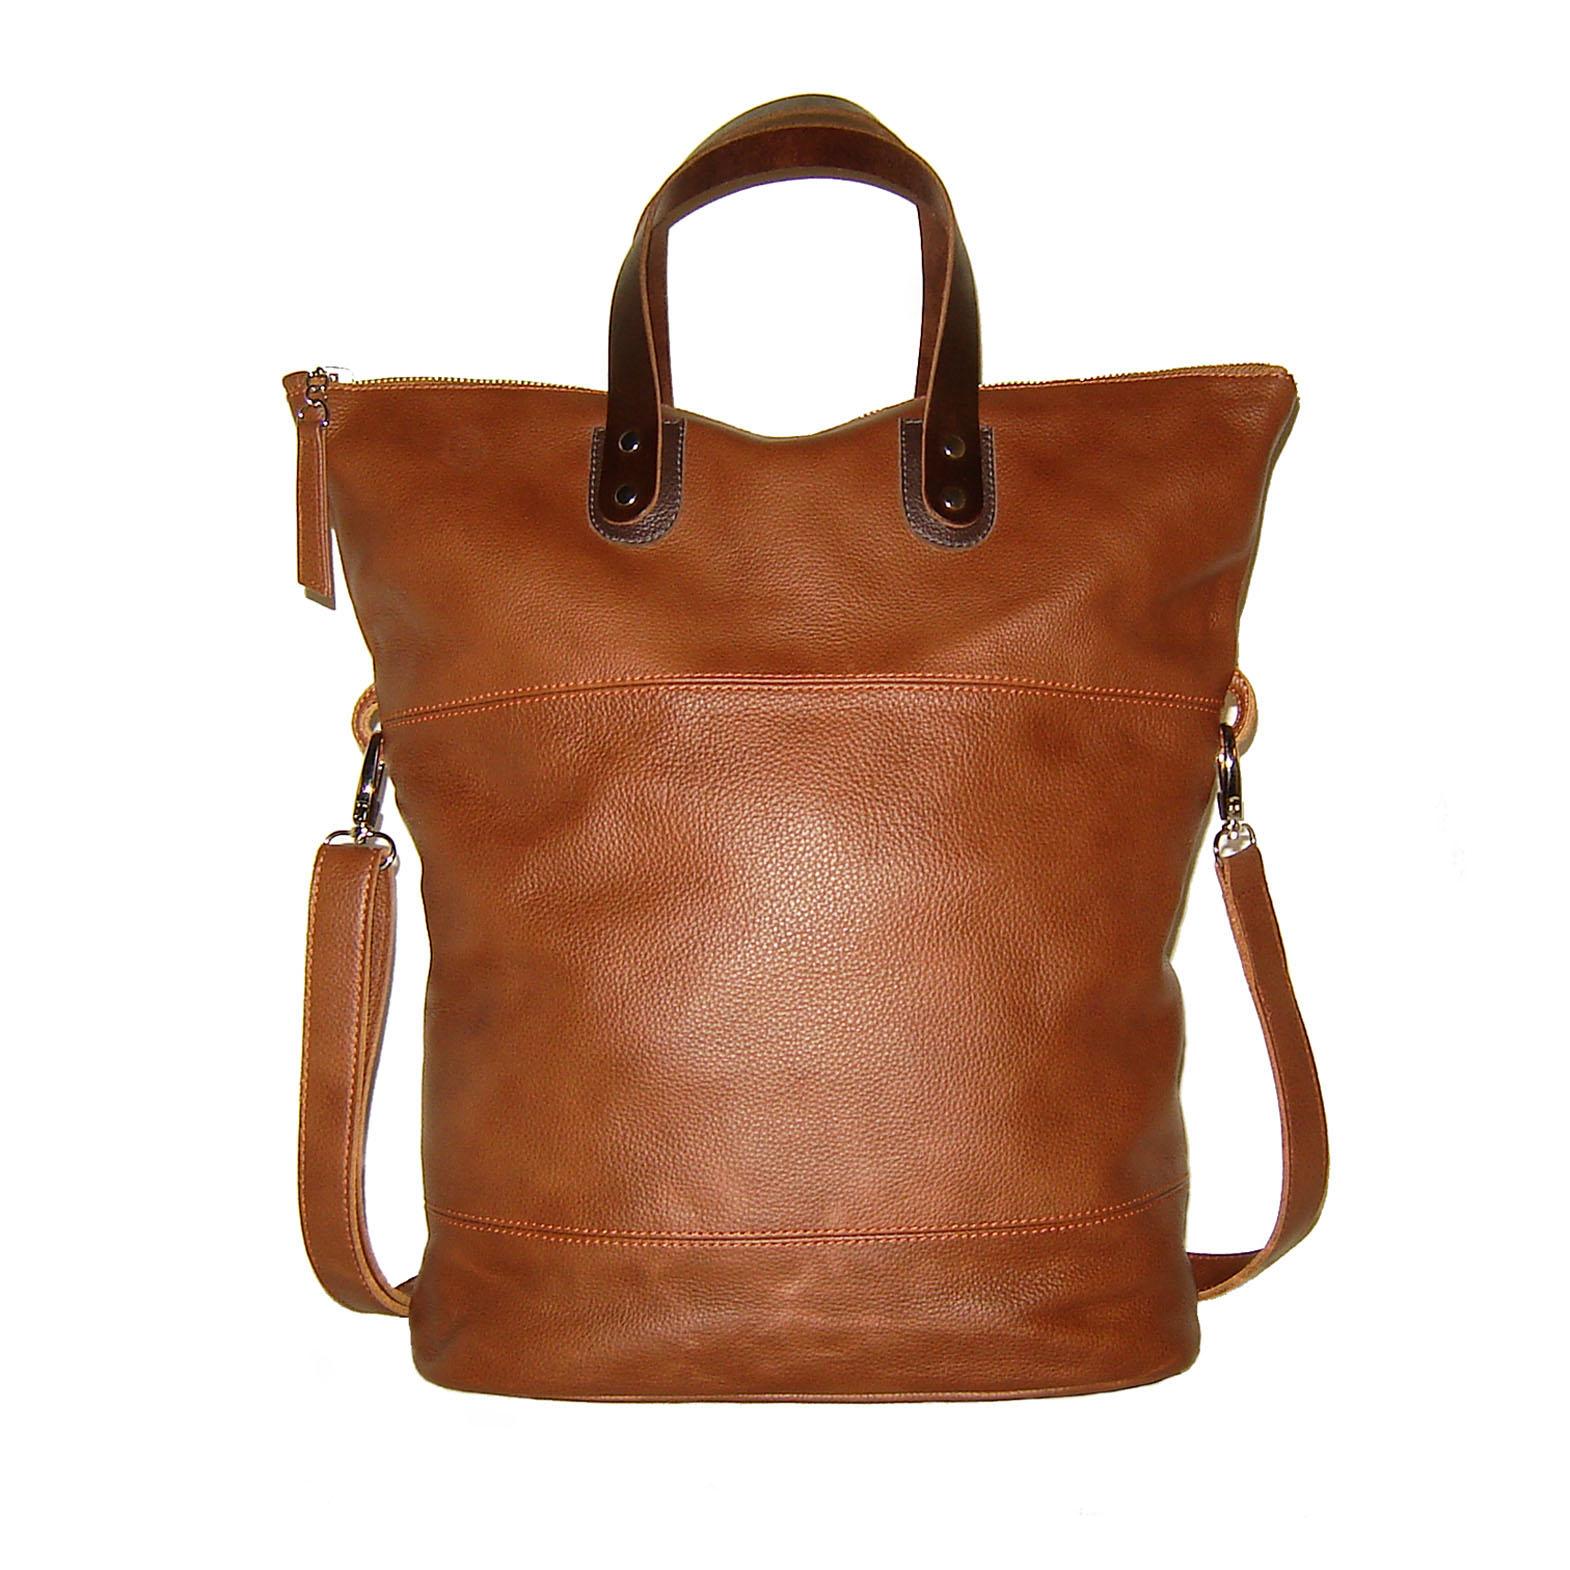 Lush Leathers  Canadian Handmade Leather Bags 7523b0e9eb93